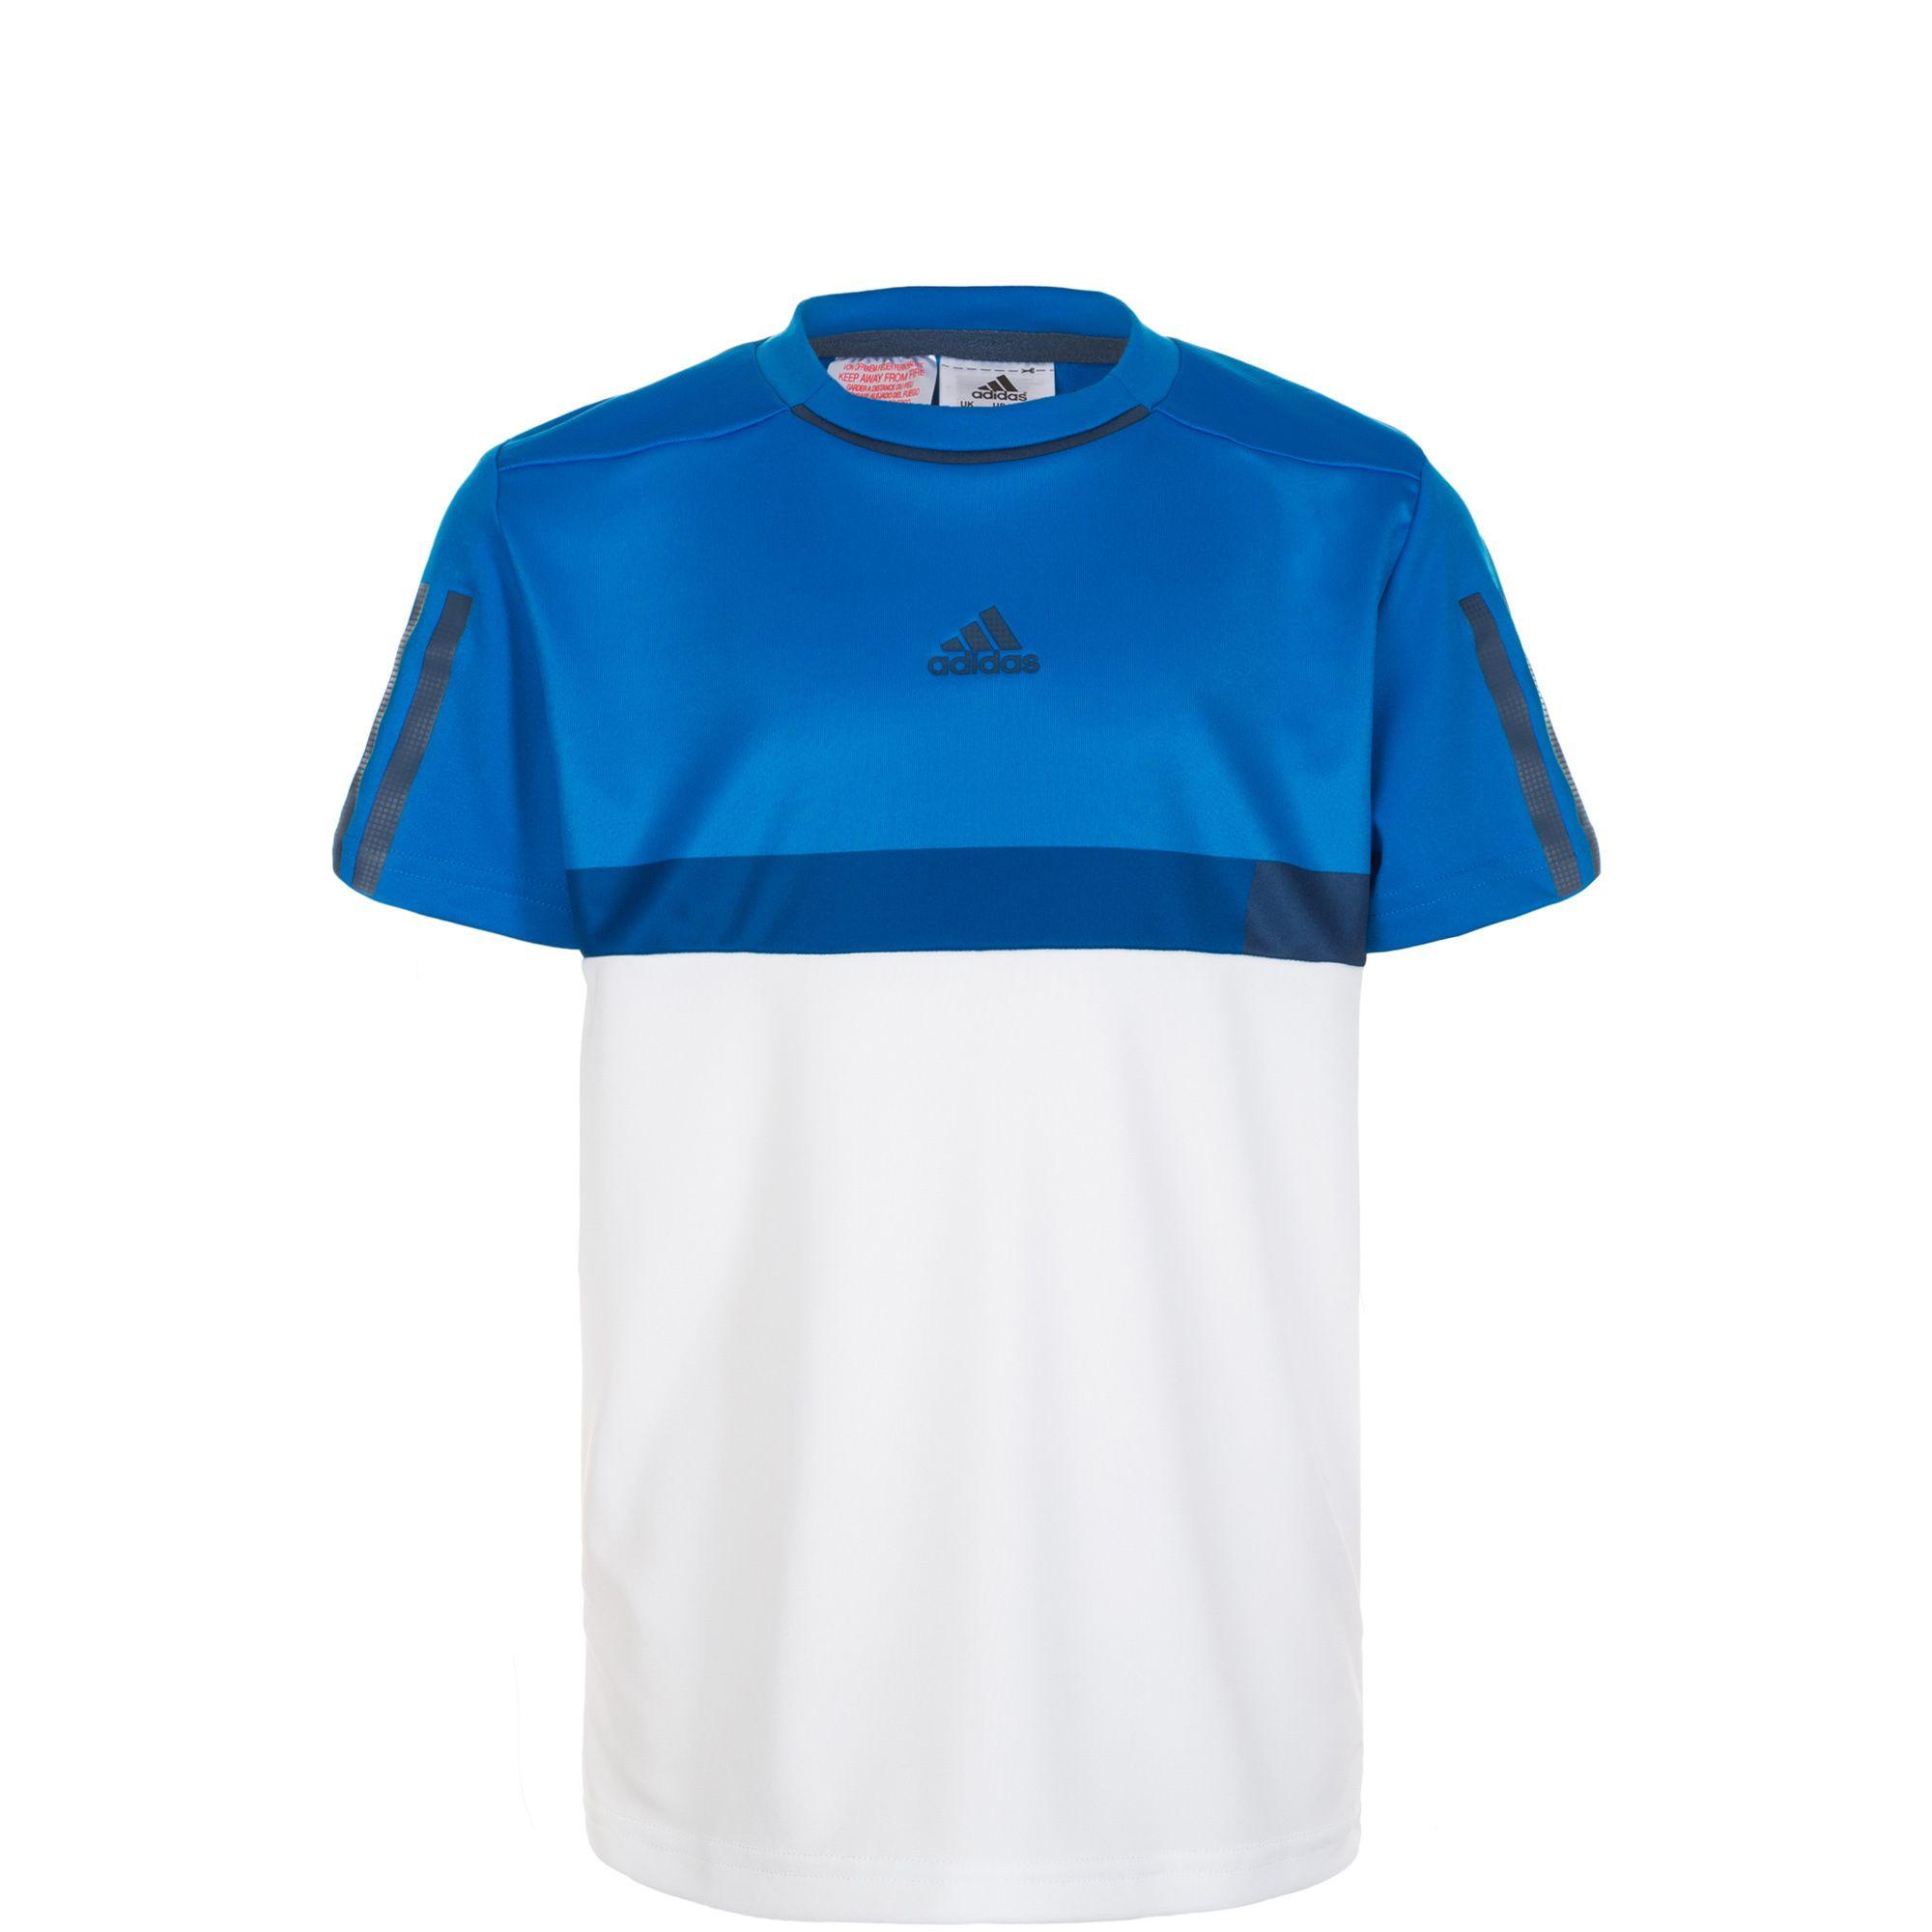 ADIDAS PERFORMANCE adidas Performance Barricade Tennisshirt Kinder